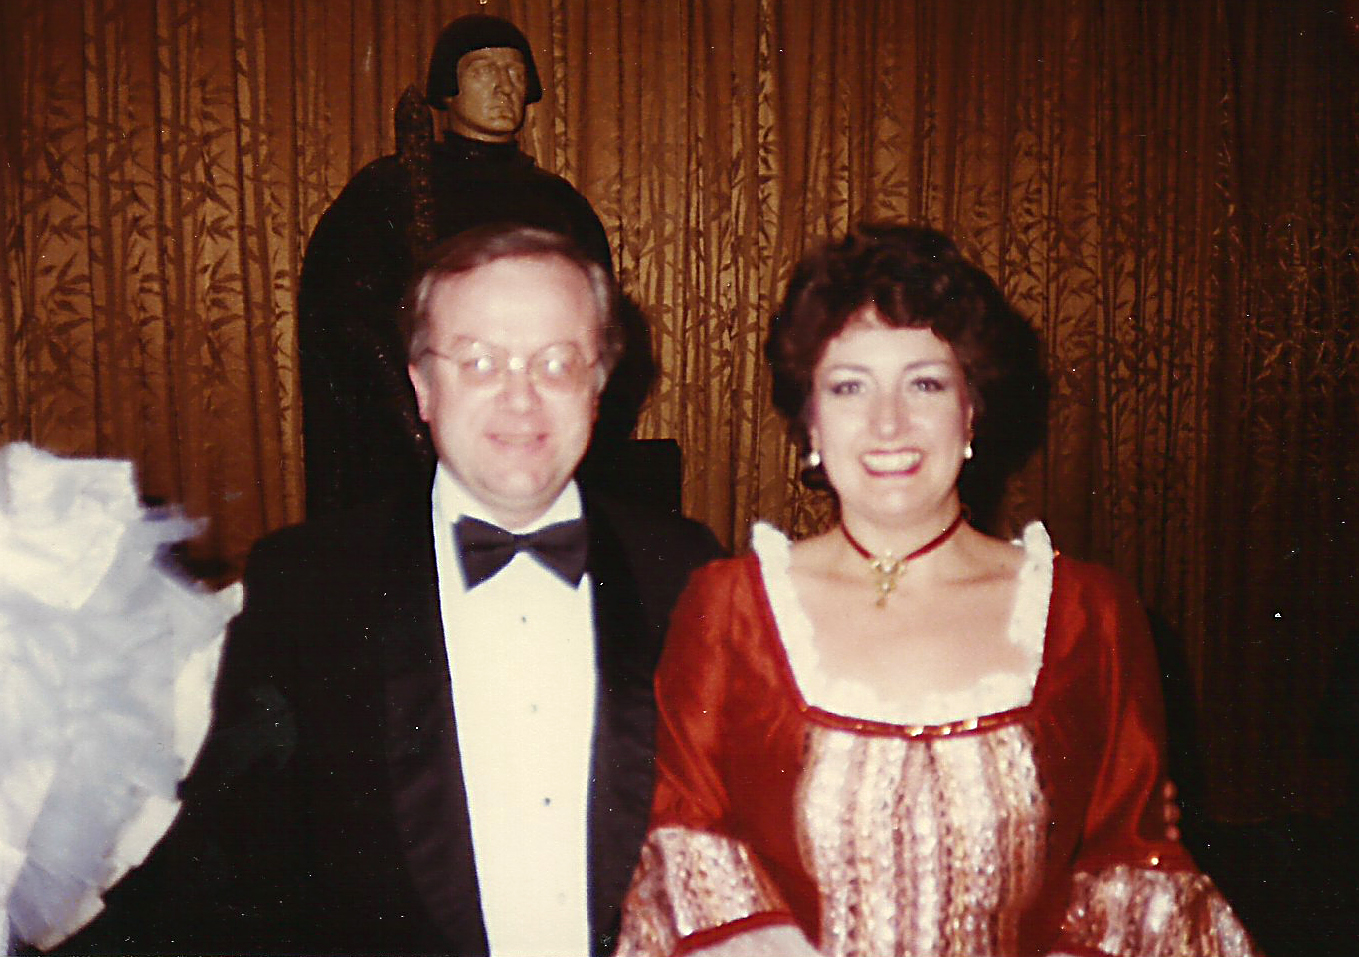 Liederkranz Studio Opera, Der Rosenkavalier, New York City, 1986 – Janice as Annina, Maestro John Balme